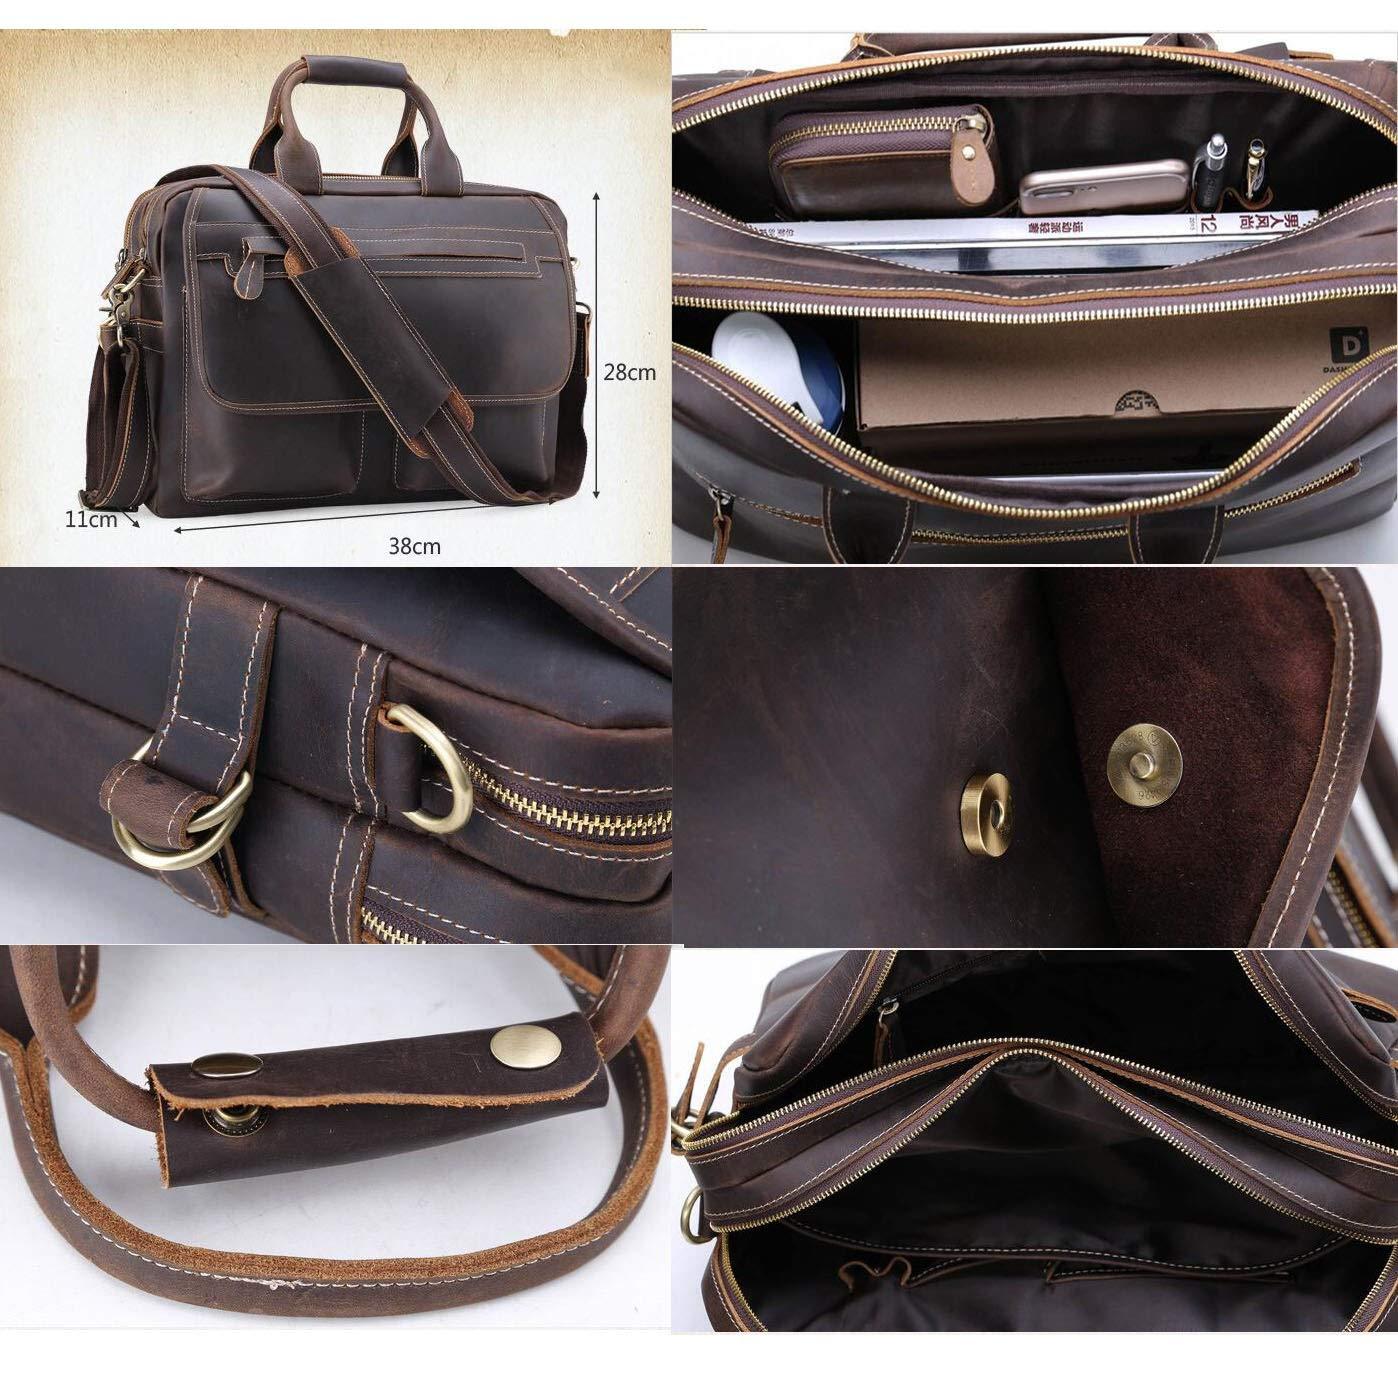 Mens Crazy Horse Leather Handbag Diagonal Bag Double Zipper Large Capacity Business Bag Mens Vintage Briefcase Casual Leather Bag 15 Inch Computer Bag Travel Leisure for Work Dark Brown